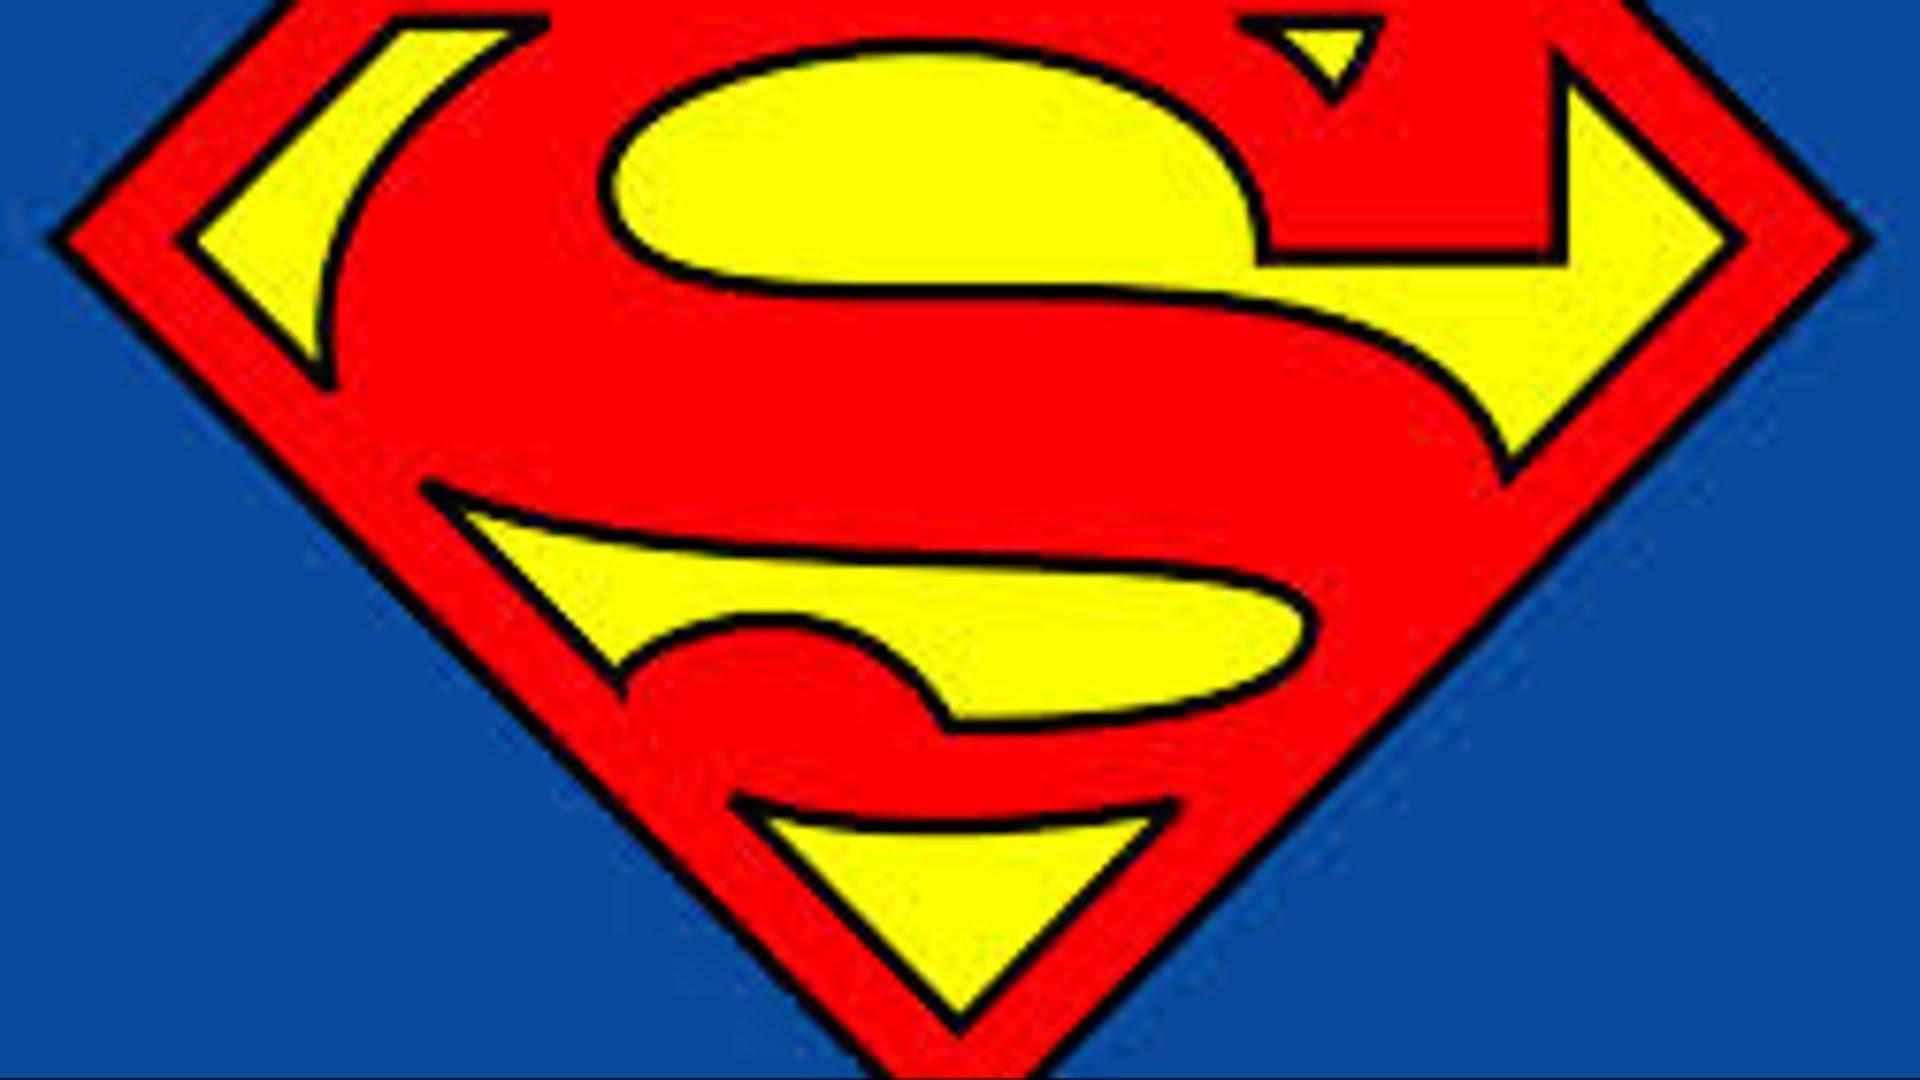 Superman Batman Symbol Wpmorganrlewis Cl-Superman Batman Symbol Wpmorganrlewis Clipart Free Clip Art-6